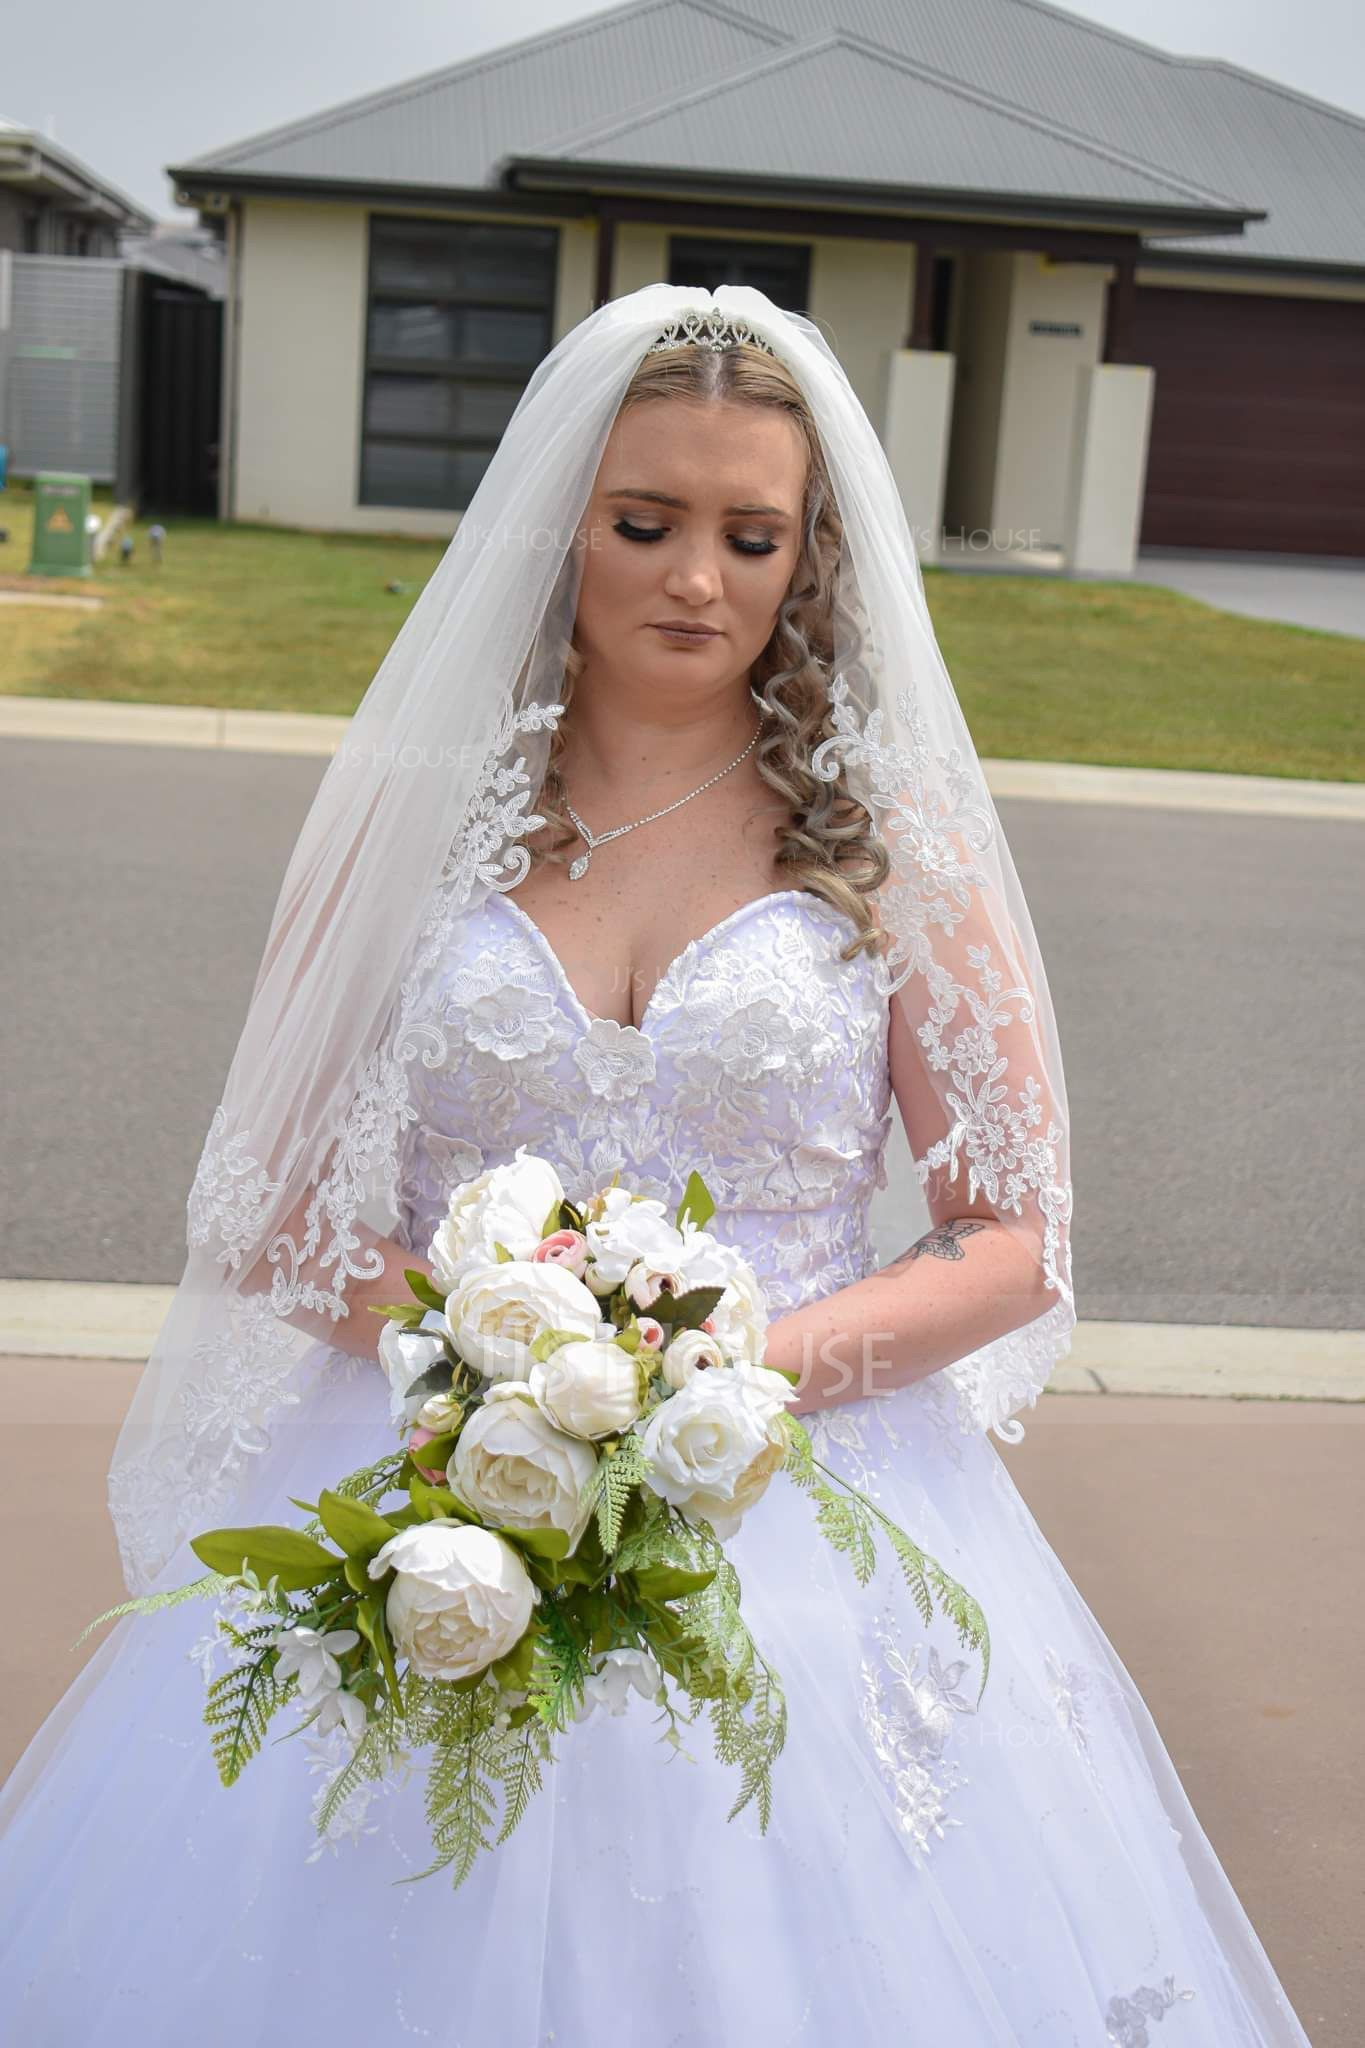 Two-tier Lace Applique Edge Elbow Bridal Veils With Lace (006150925)